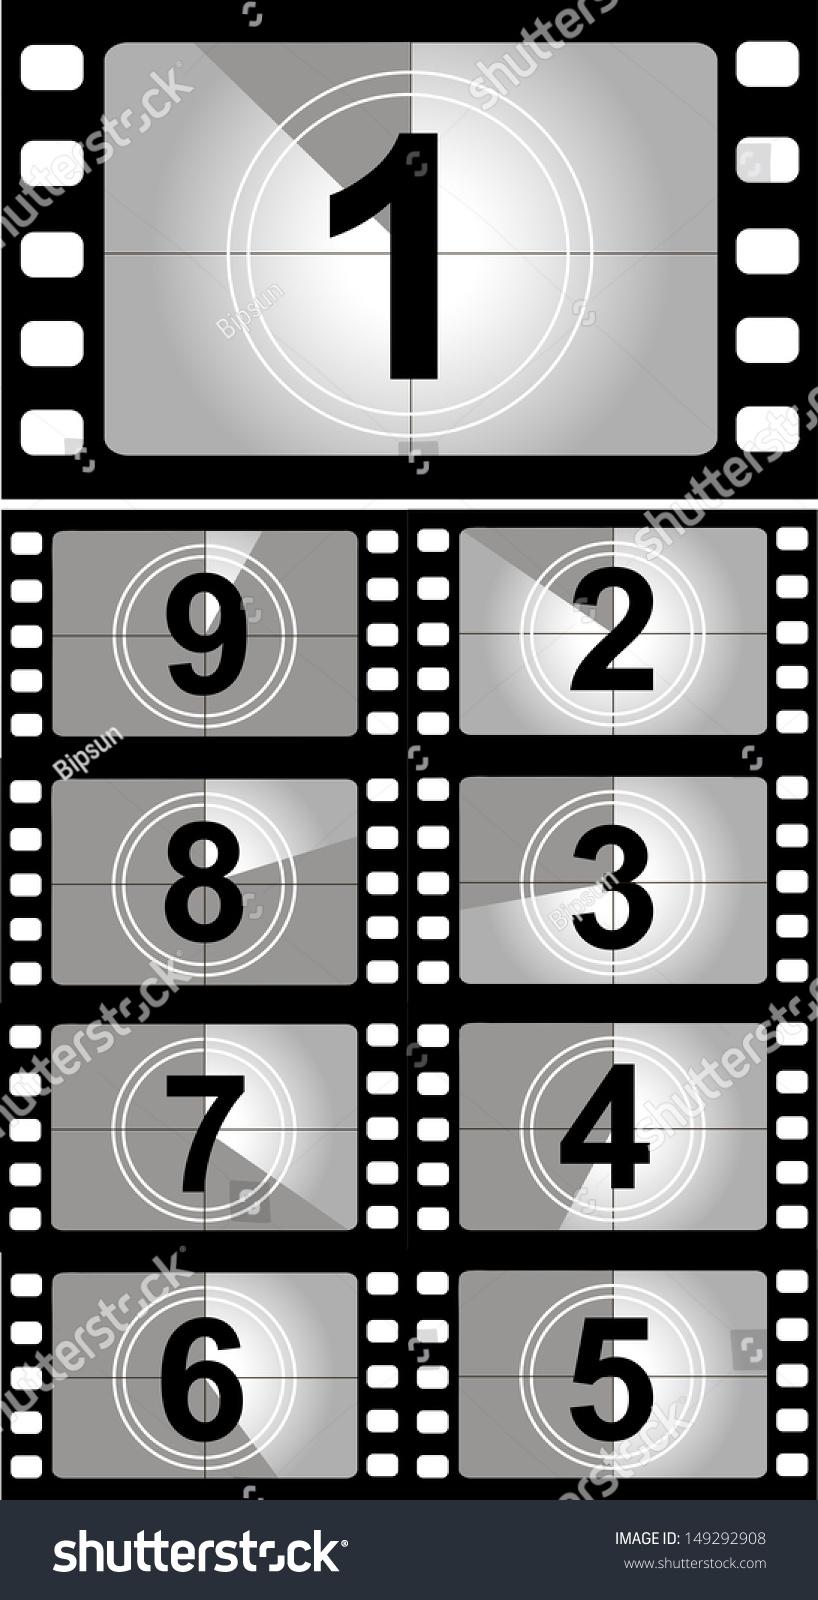 Film Countdown: Film Countdown Numbers Vector Illustration Stock Vector